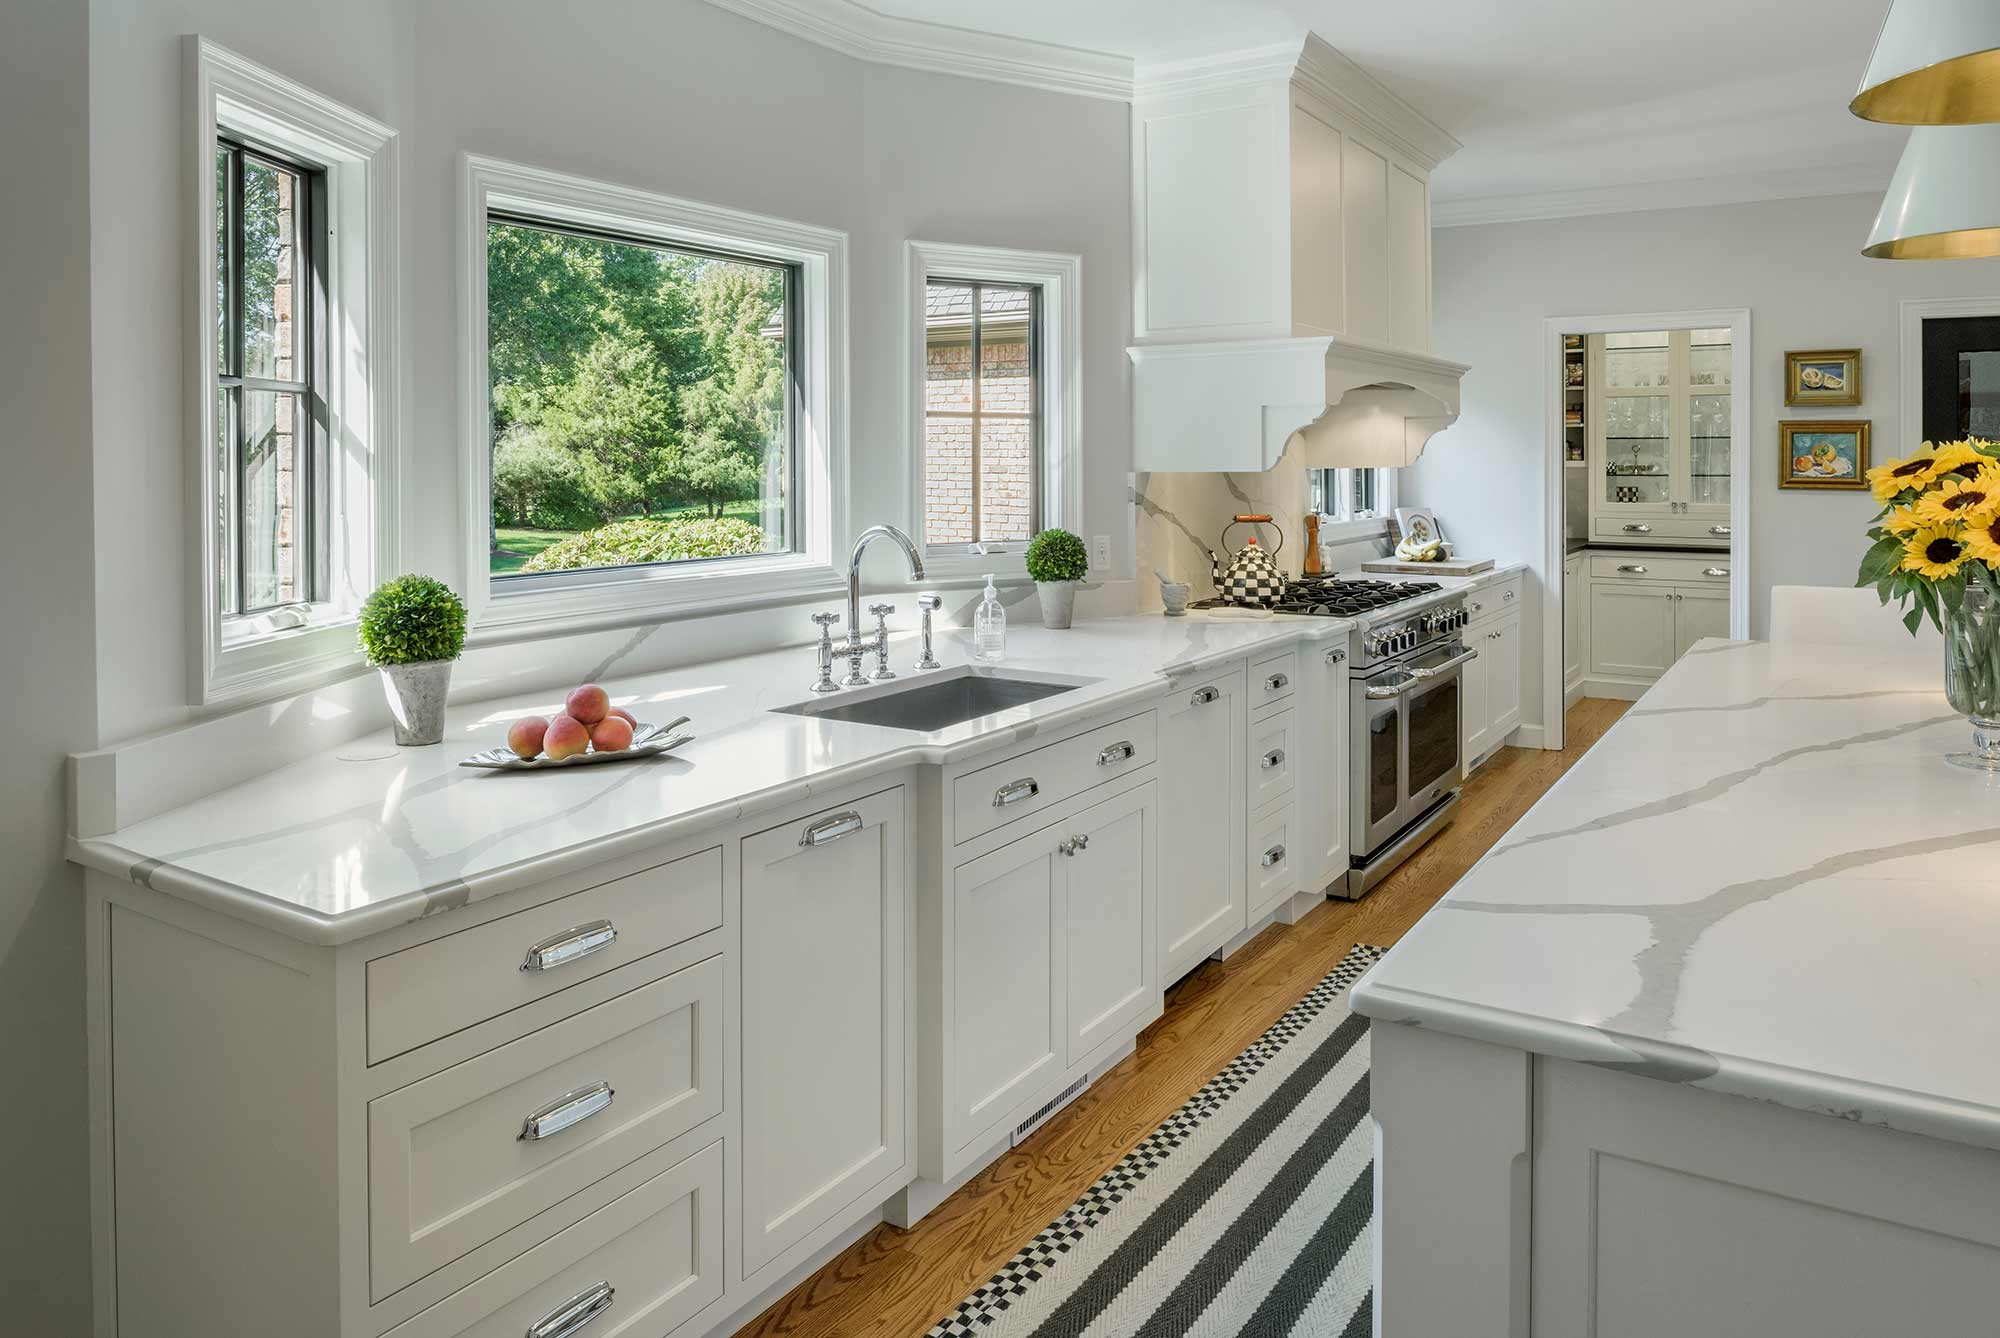 Calore Kitchen